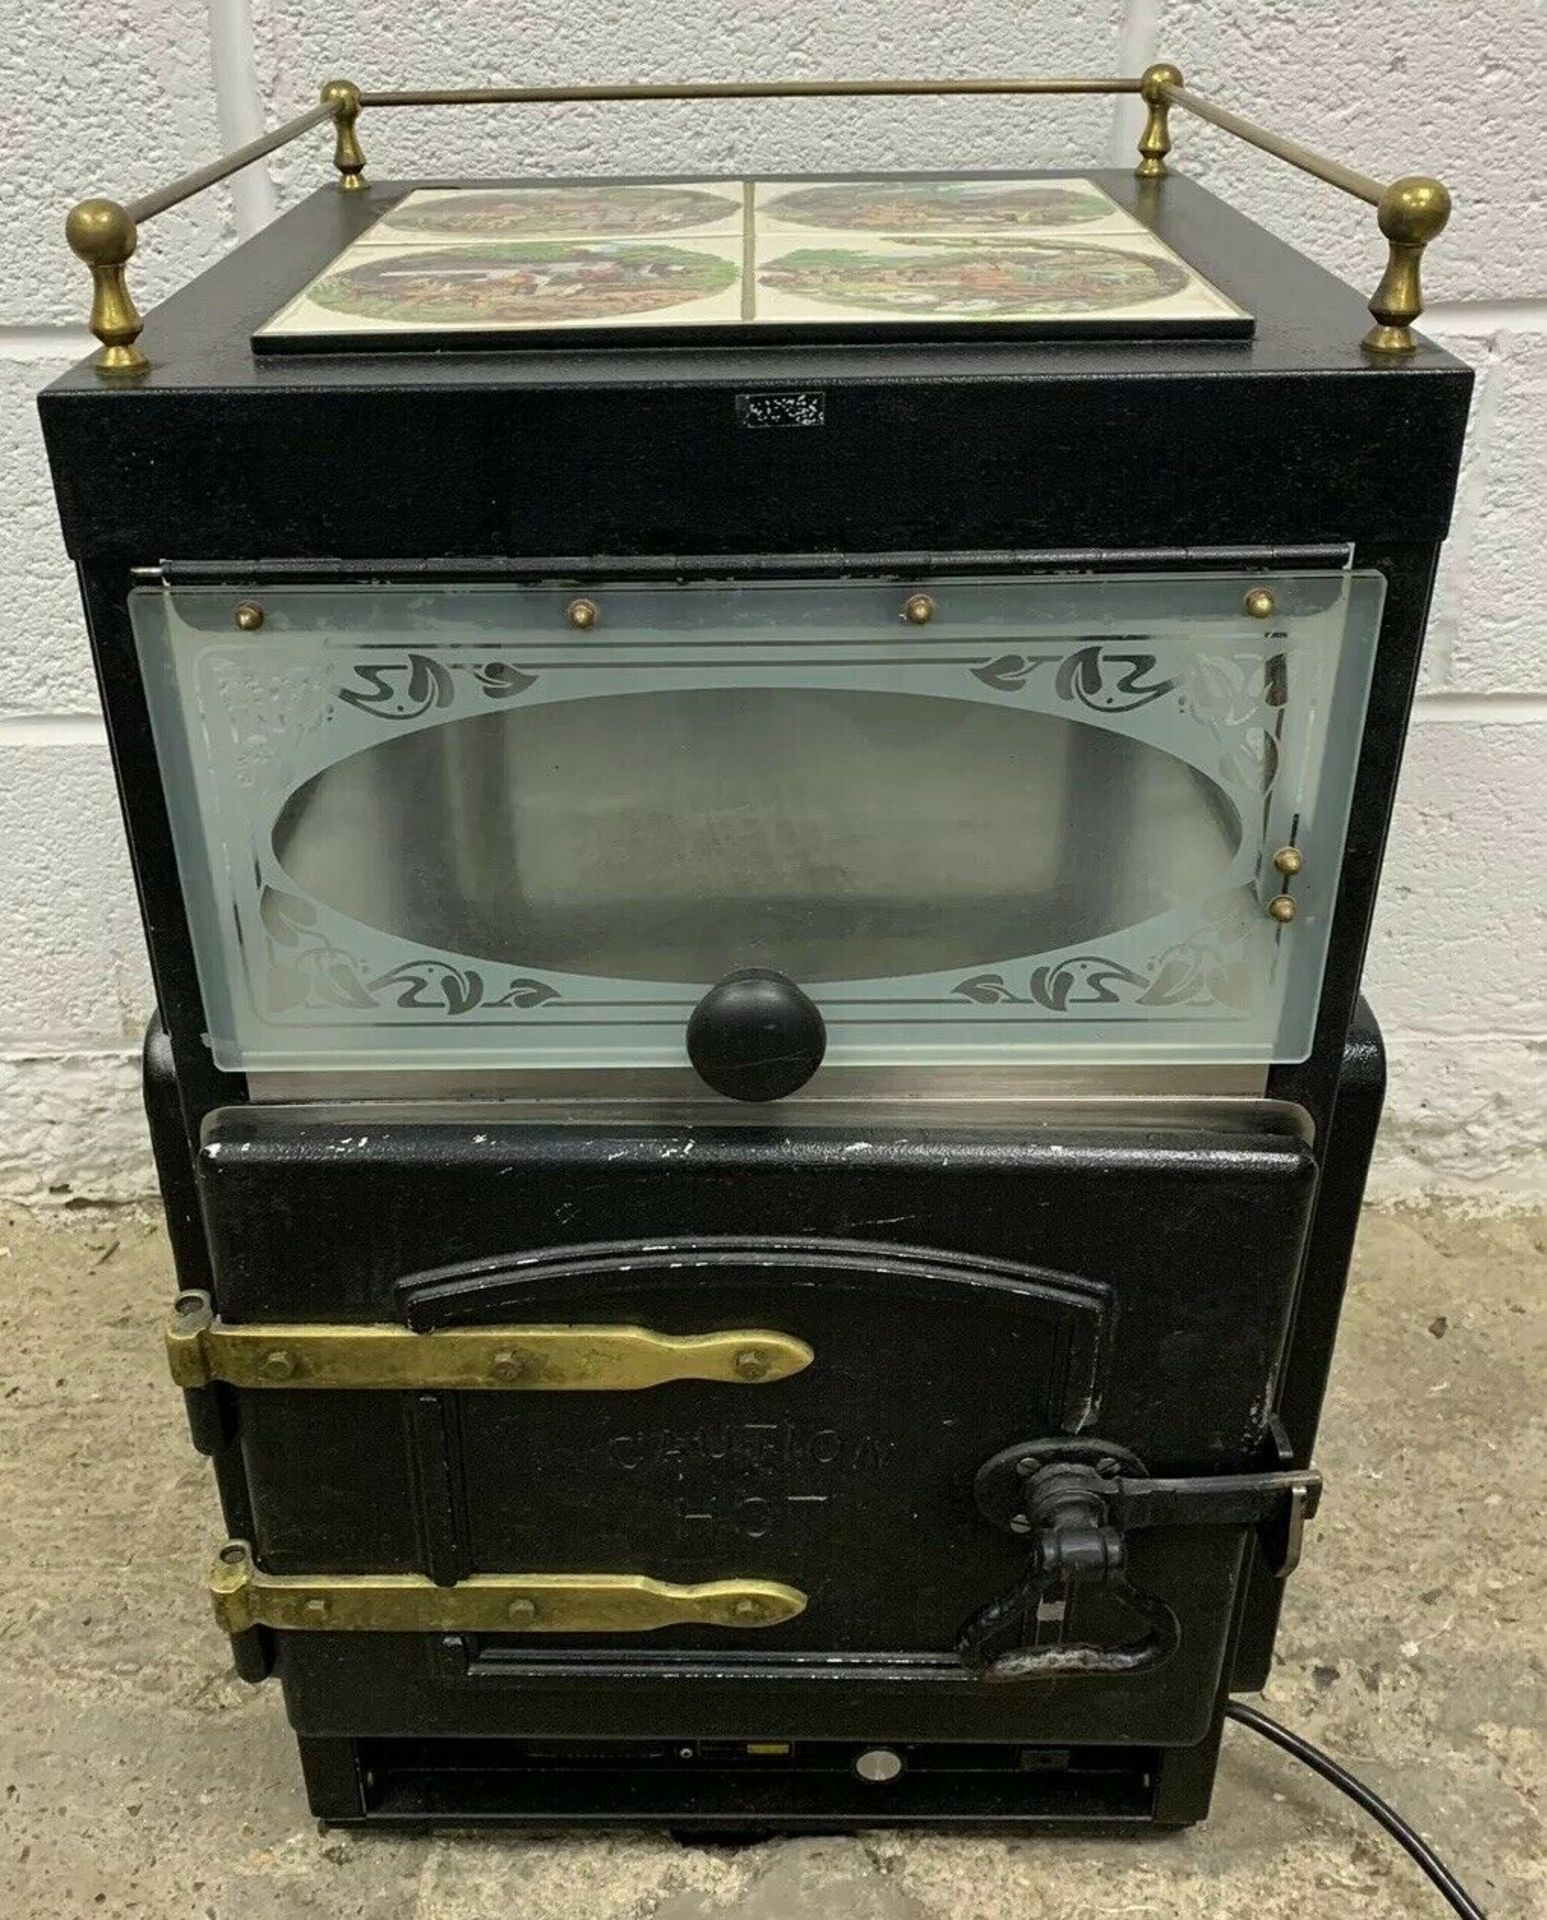 Lot 56 - Victorian Baking Ovens Queen Victoria Potato Oven